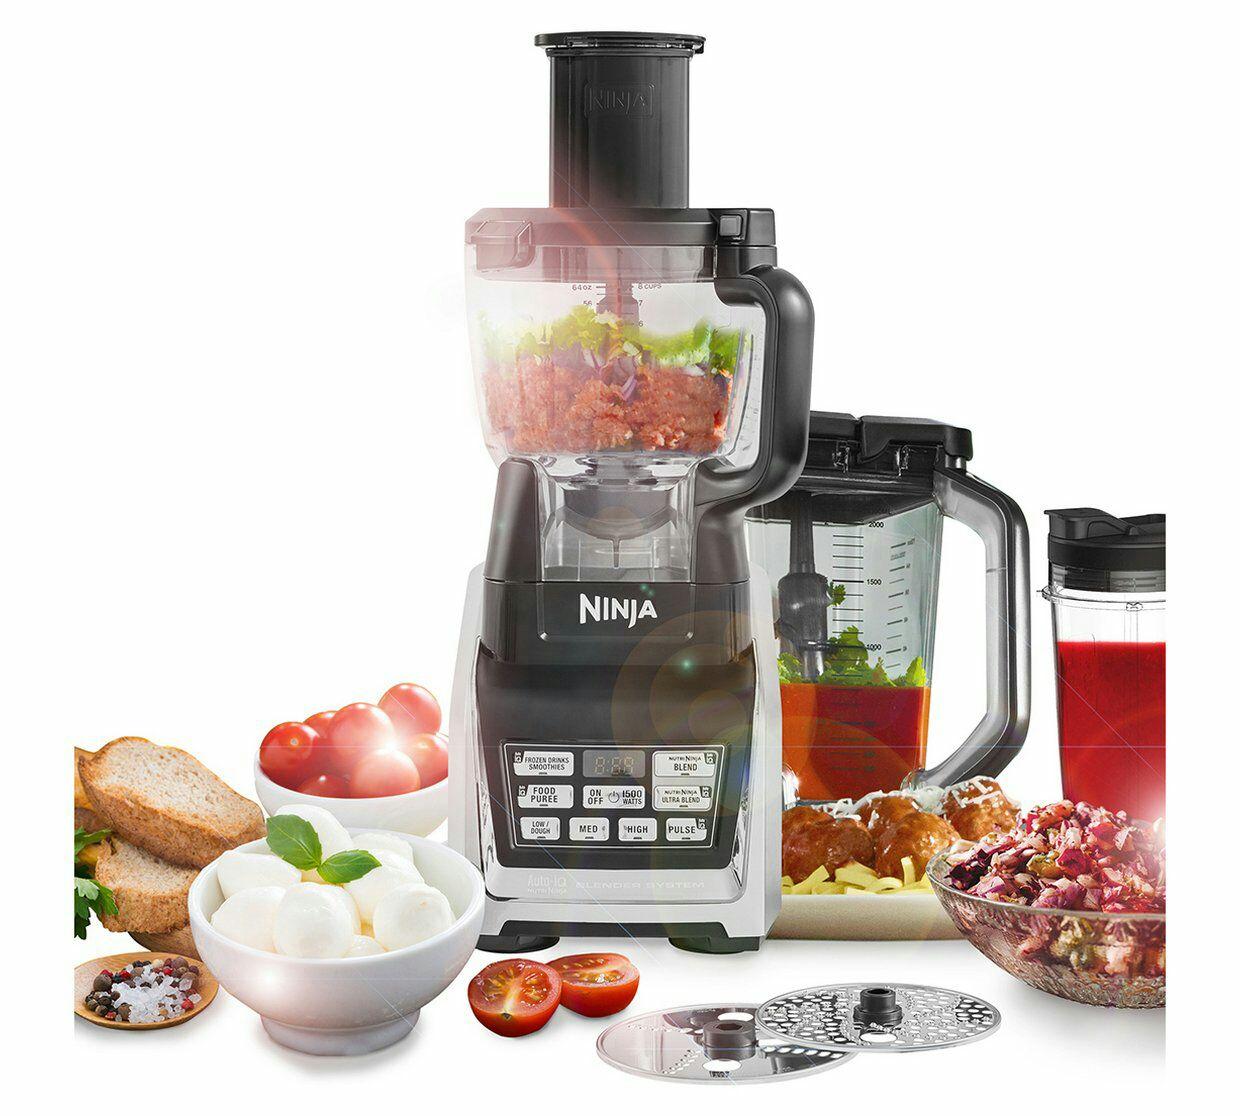 Ninja Kitchen System with Nutri Ninja – BL682 £114.99 @ Argos